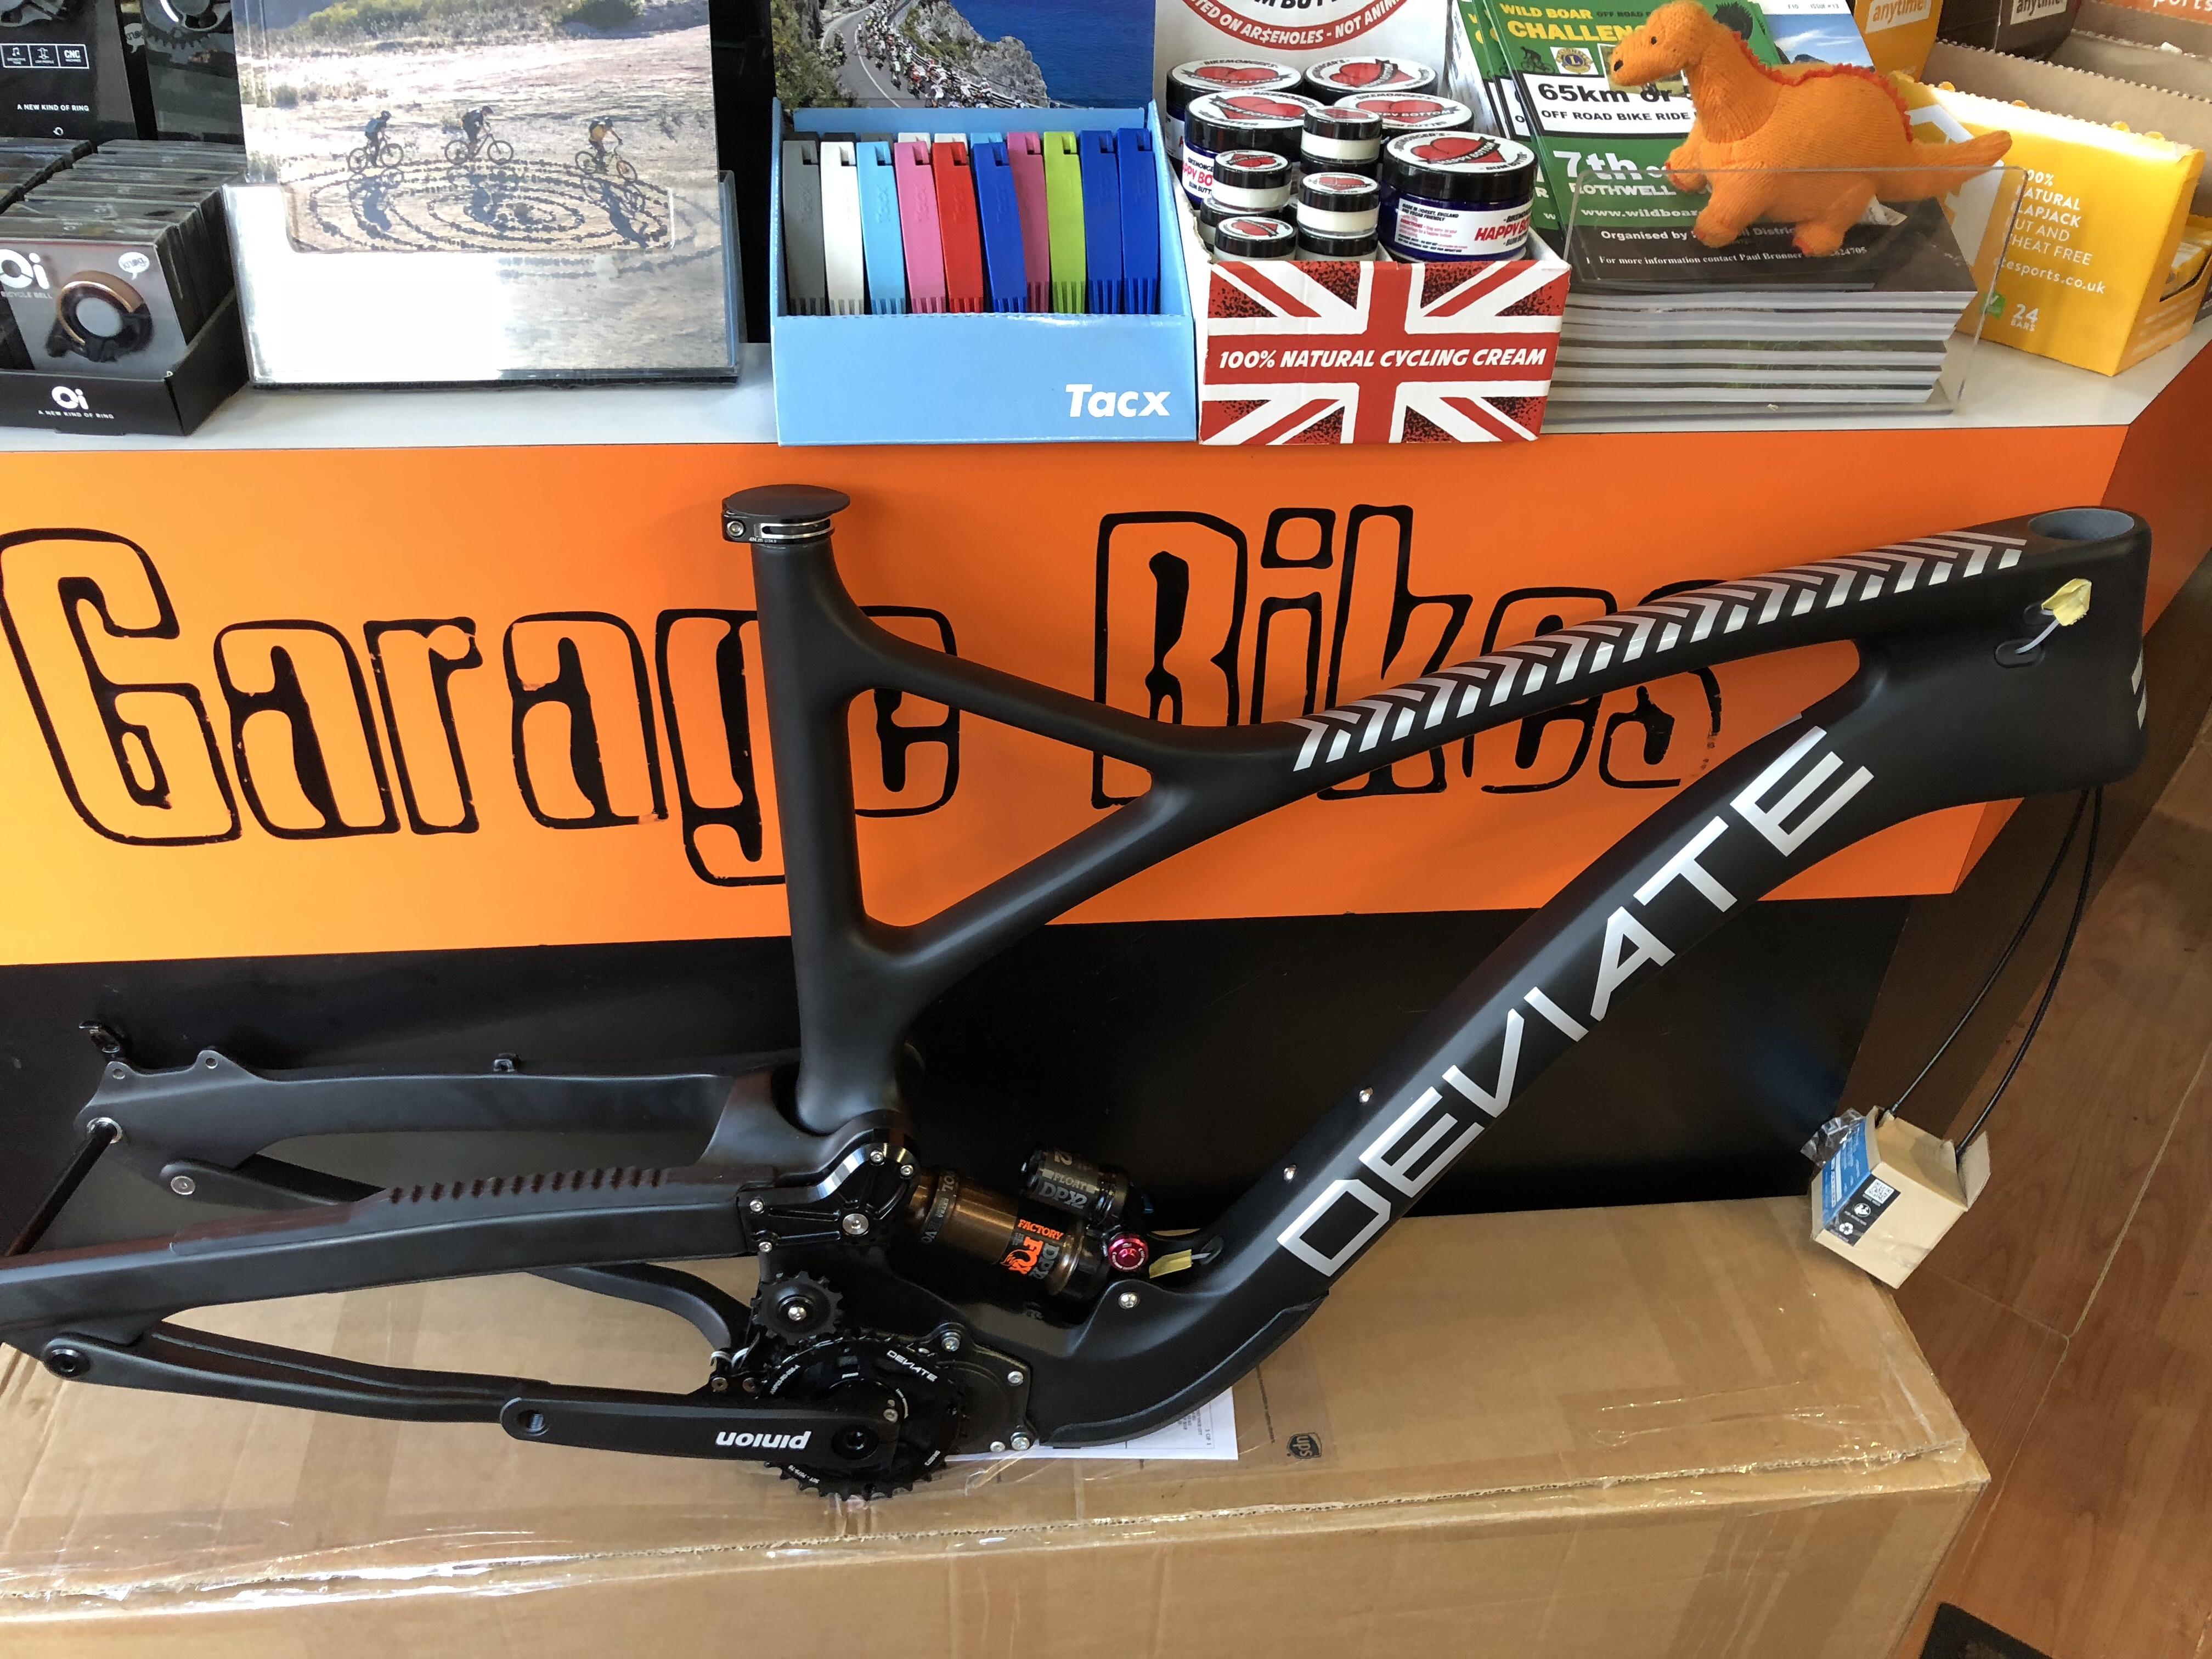 b3a157be6f1 Deviate Guide, ready to go! - BikeRadar Forum